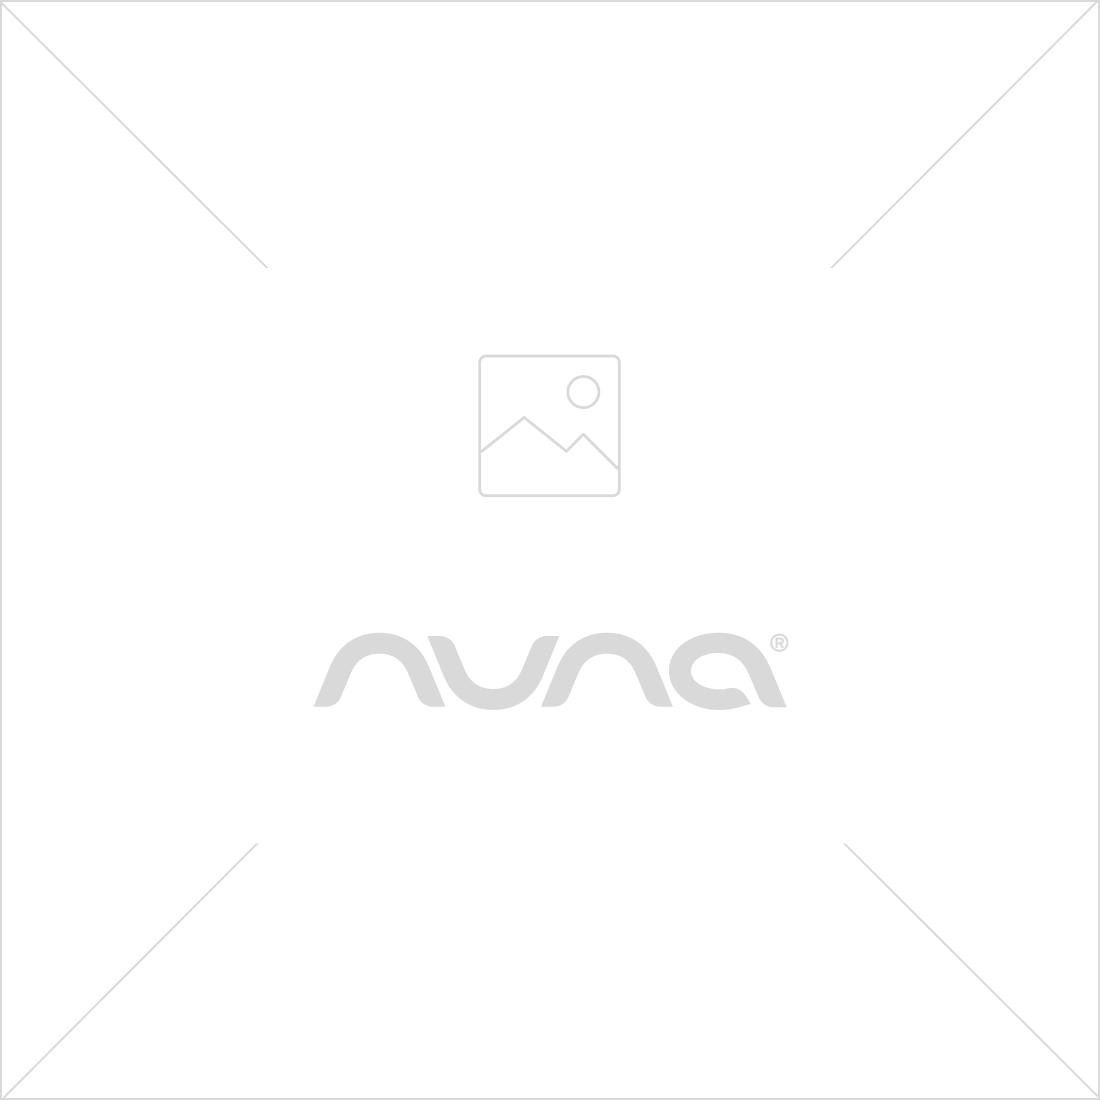 pipa icon nuna